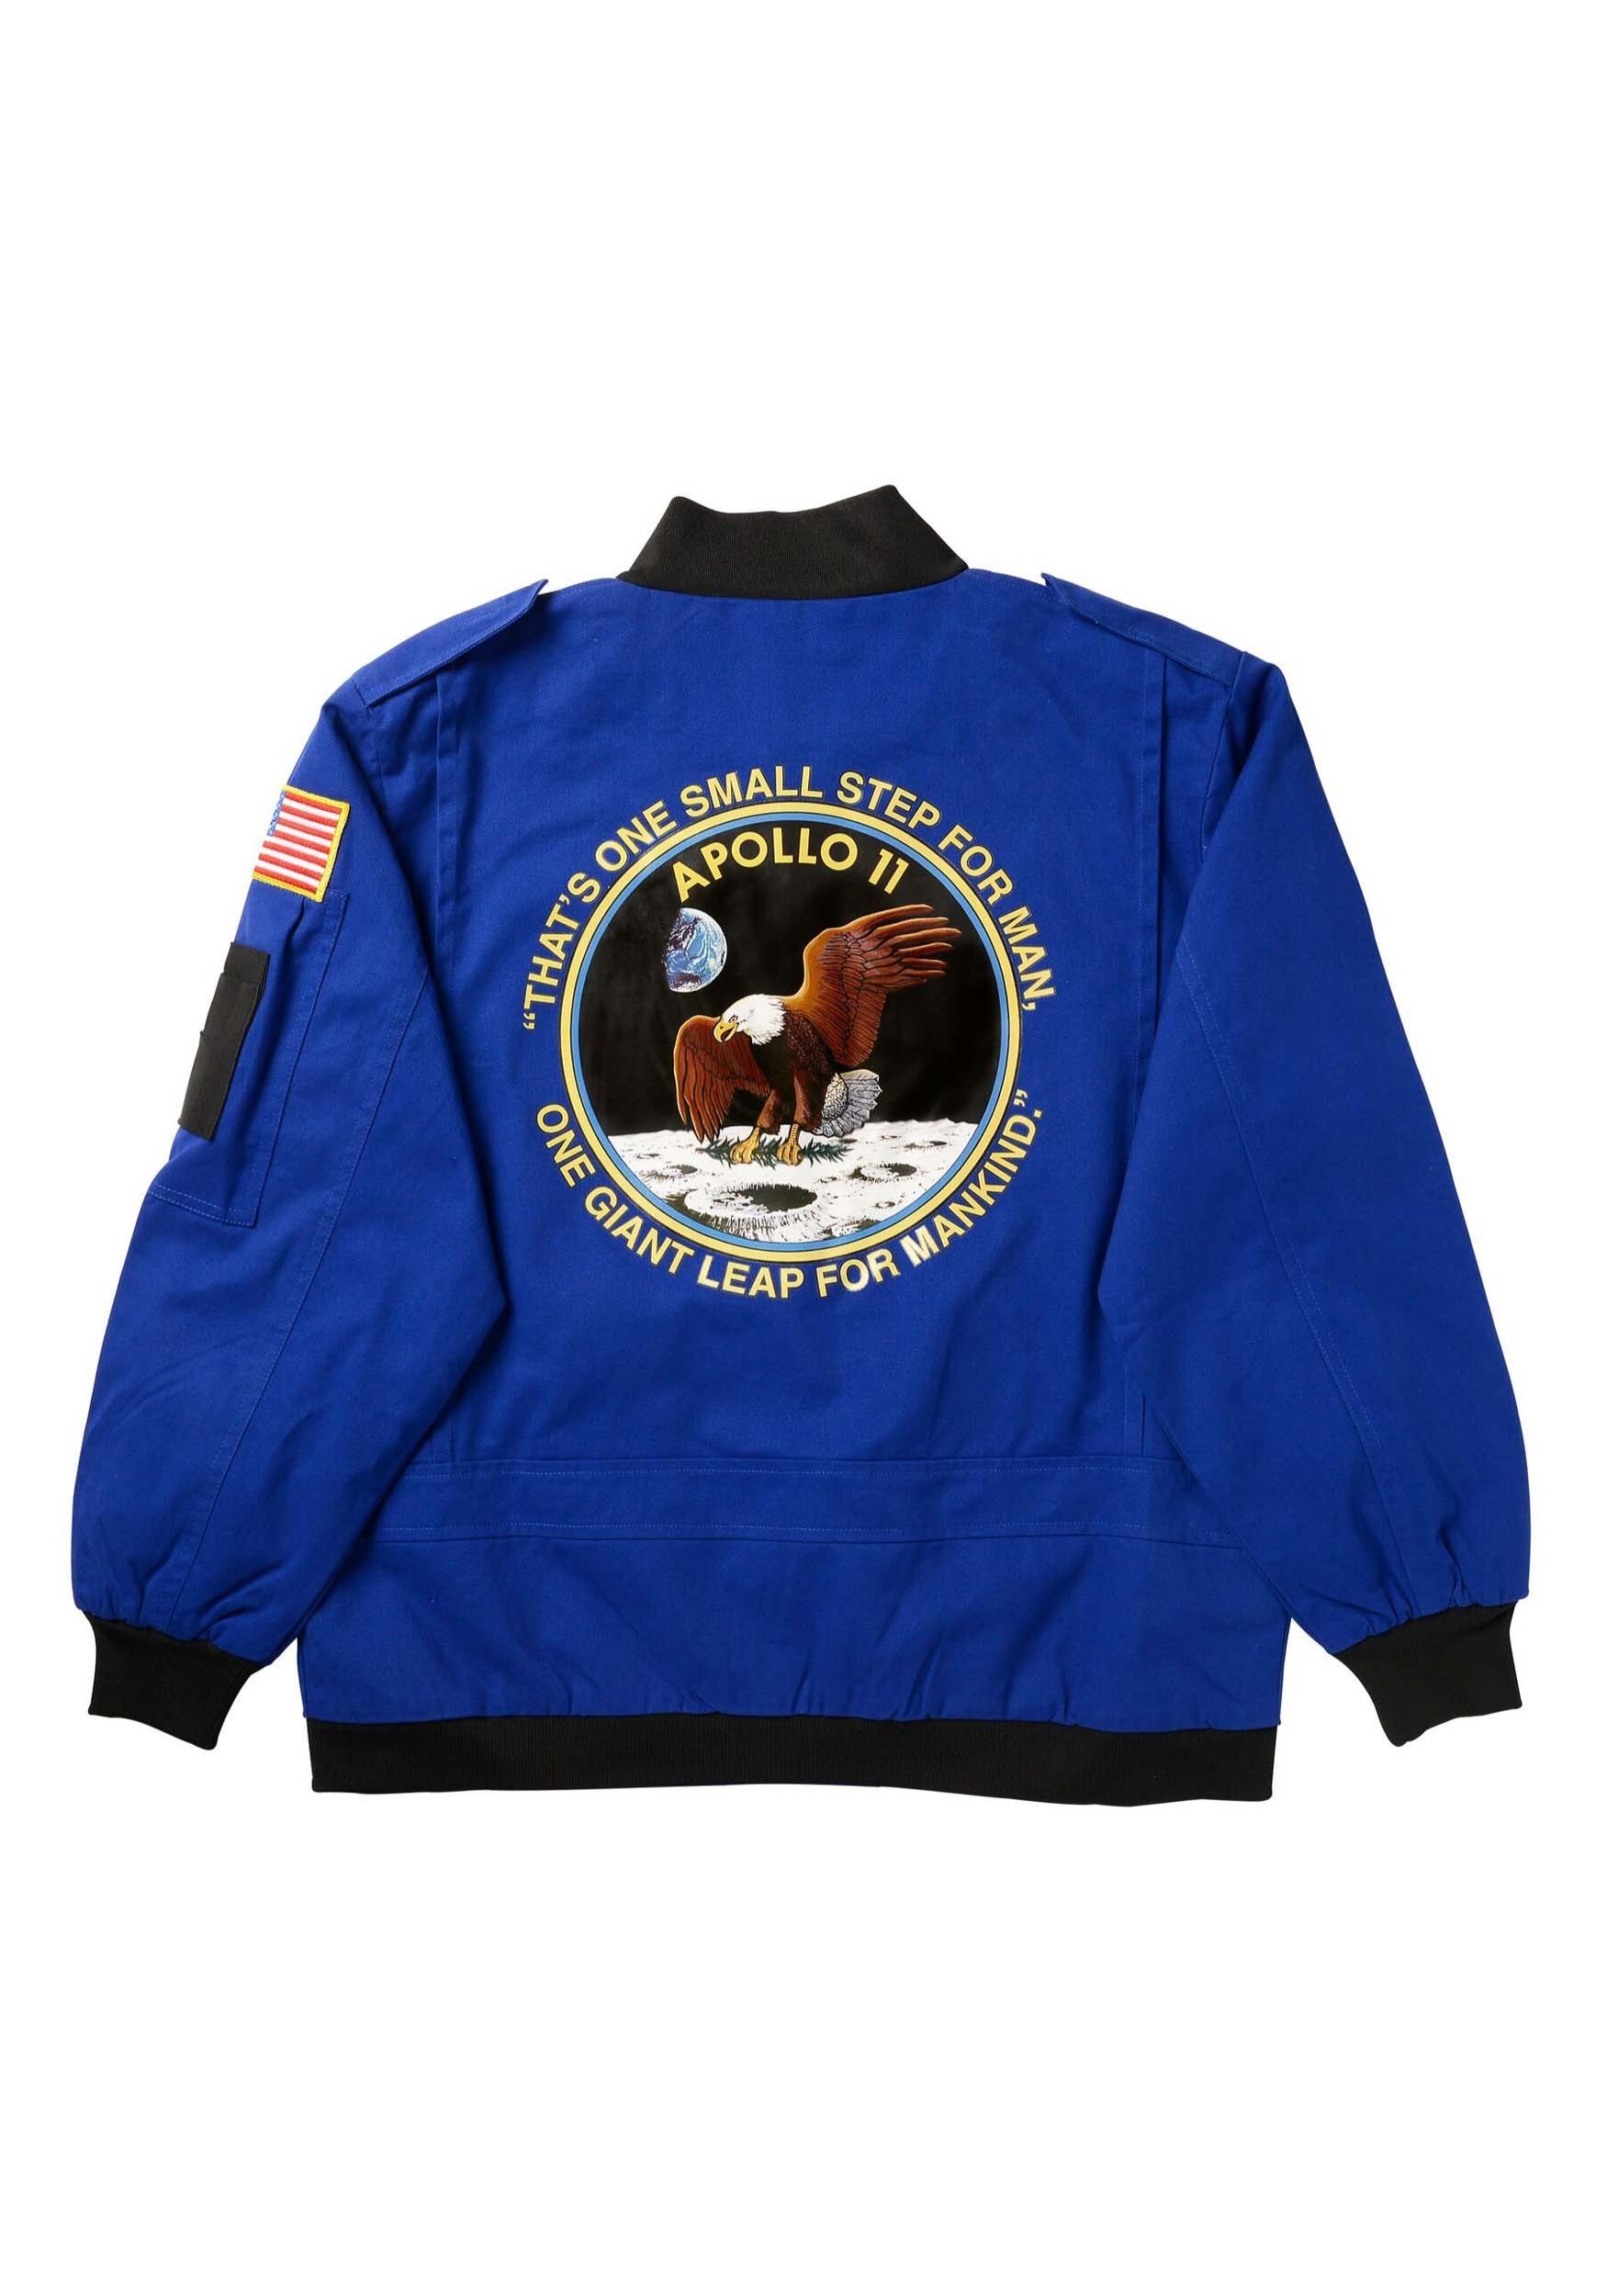 nasa apollo flight jacket - photo #20